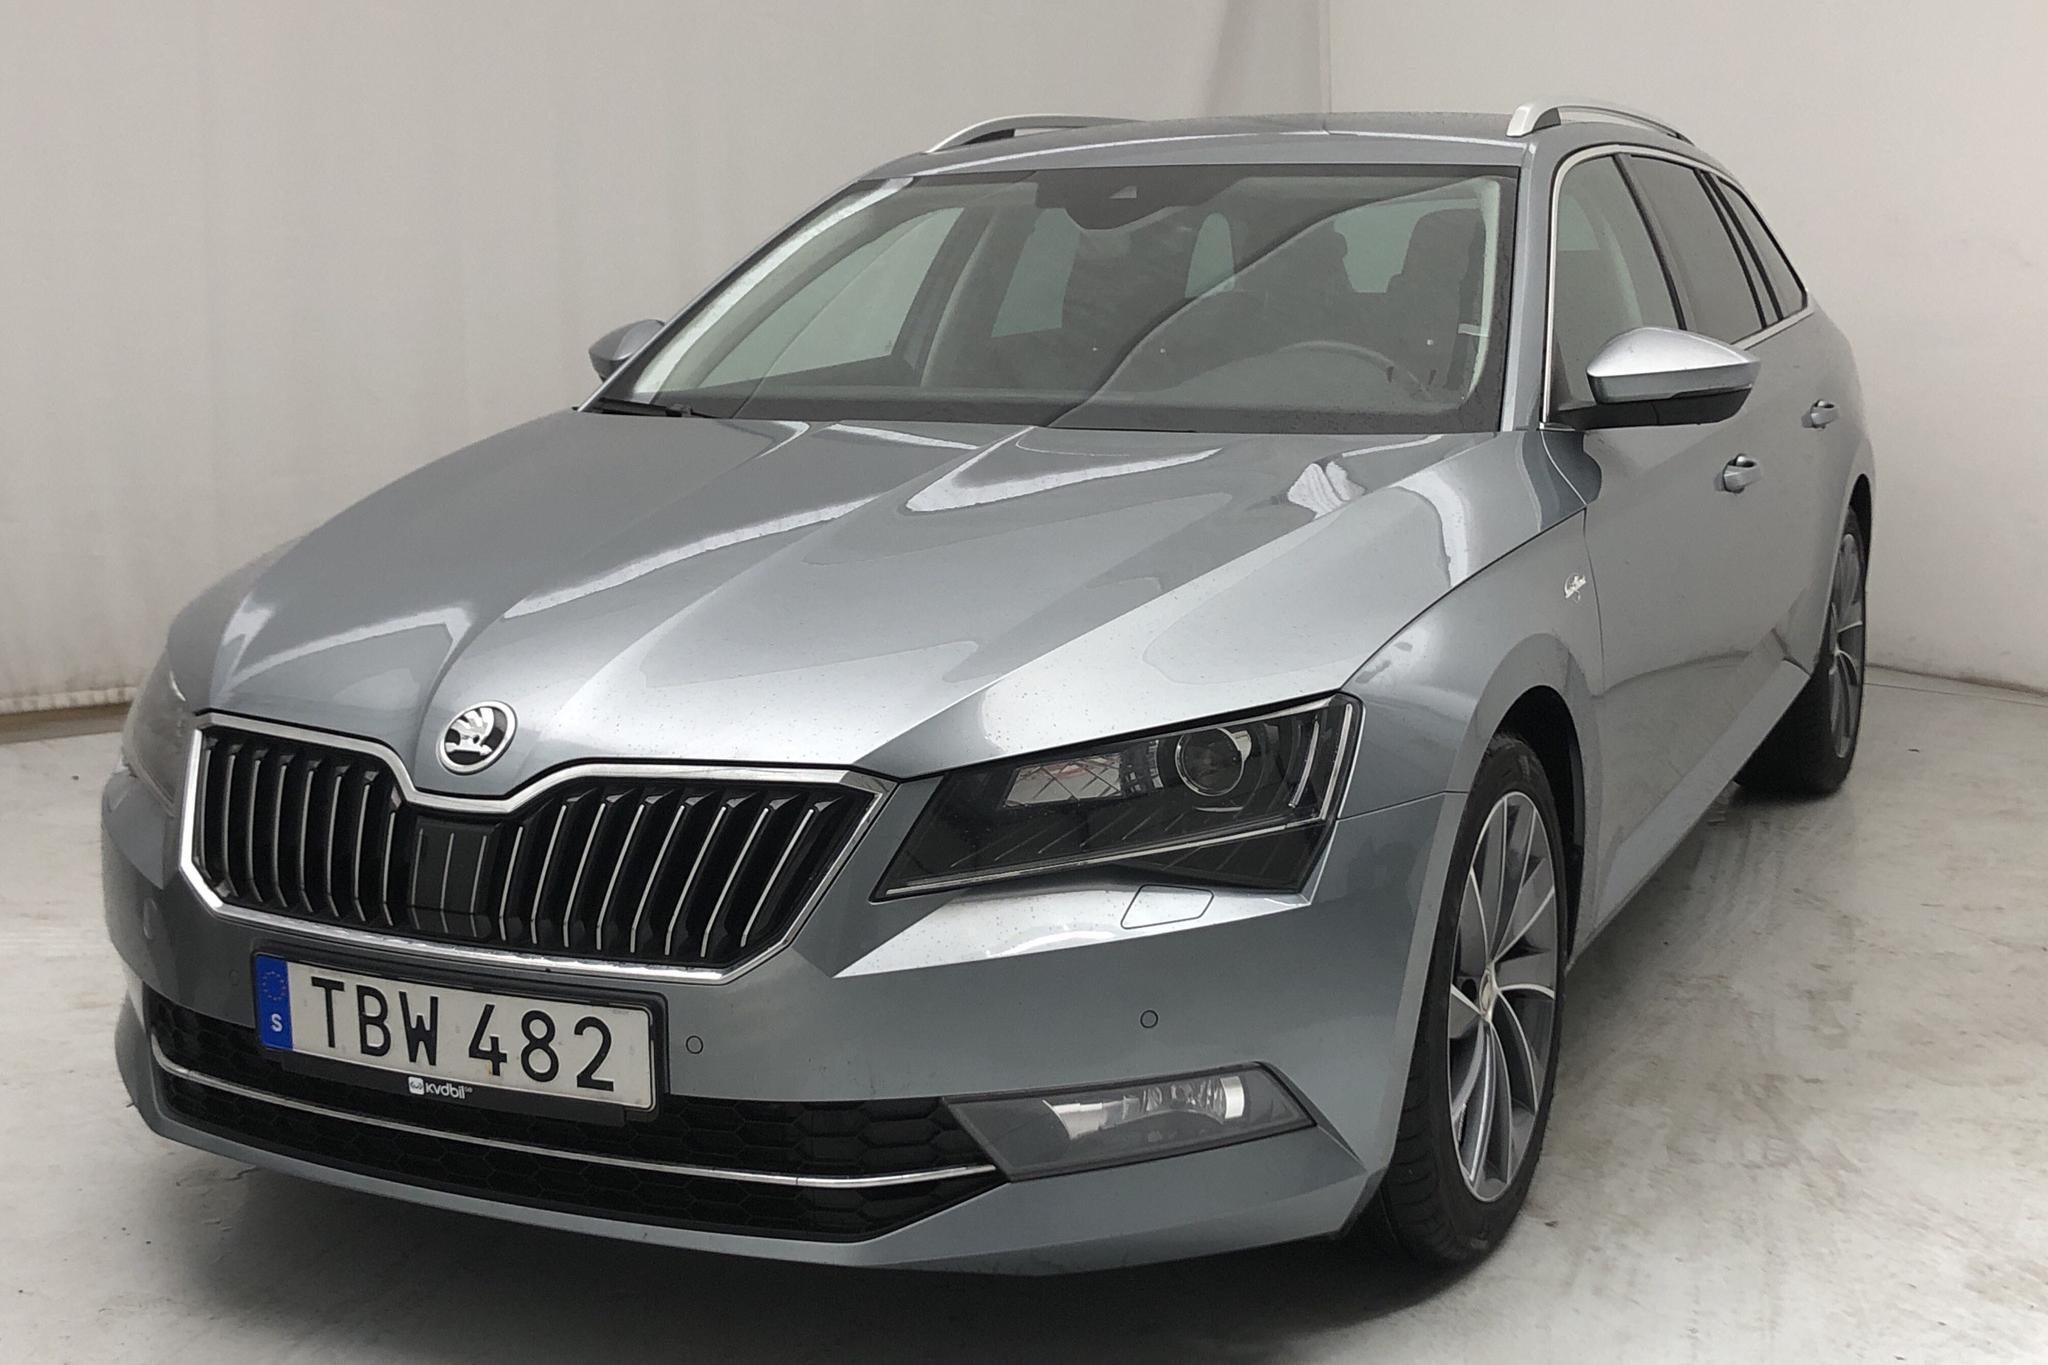 Skoda Superb 2.0 TDI 4x4 Kombi (190hk) - 91 990 km - Automatic - gray - 2019